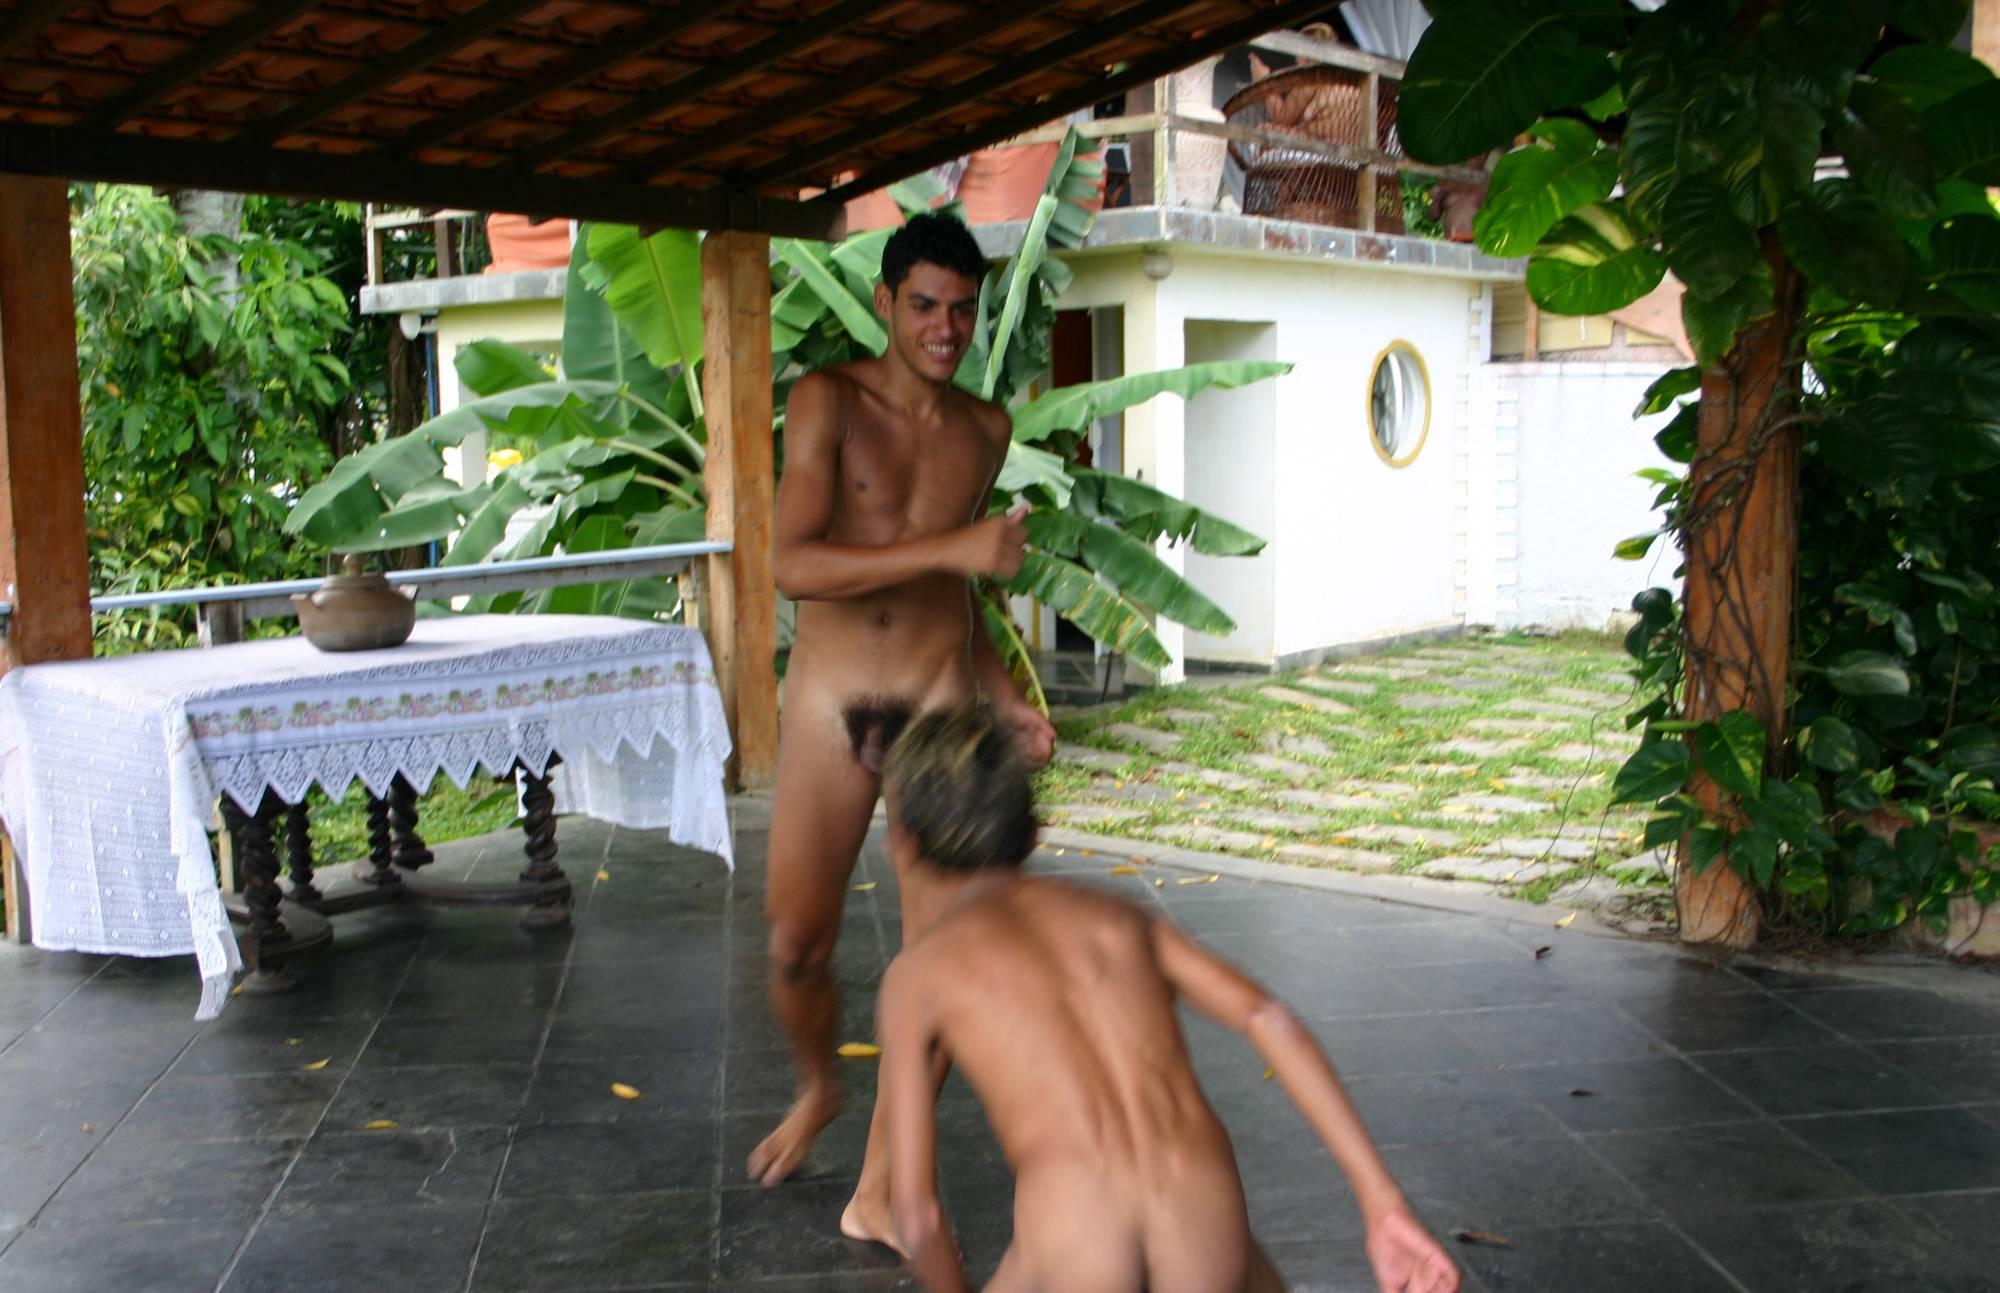 Nudist Photos Brazilian Men Are Dancing - 1